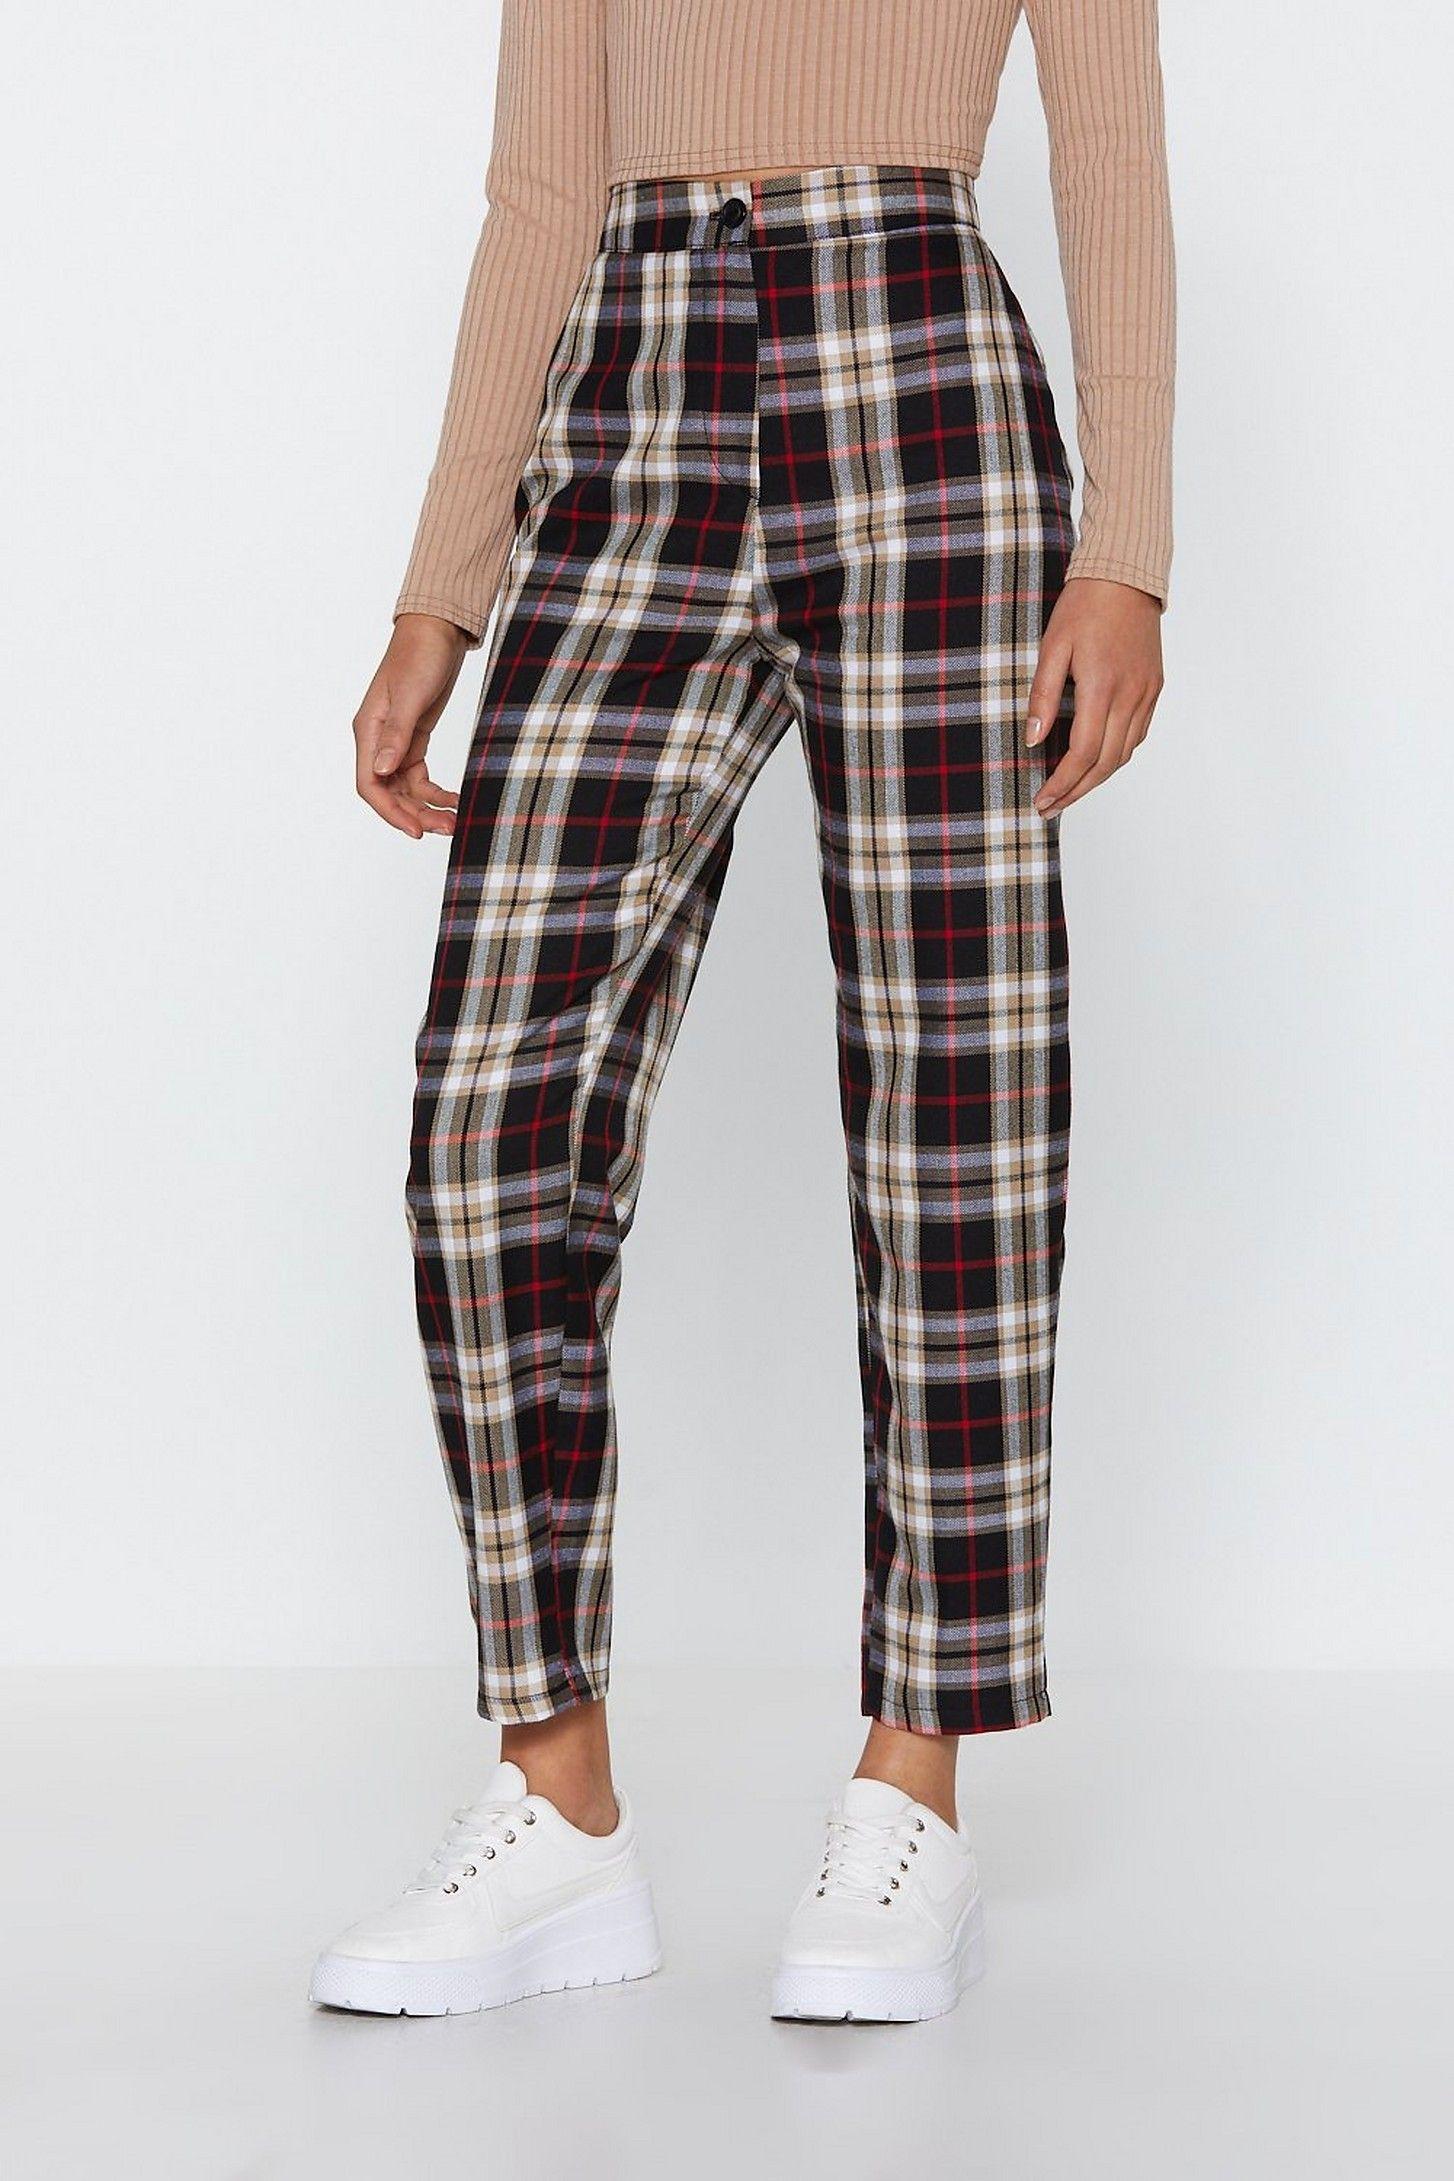 Tartan Up Tapered Pants | Nasty Gal